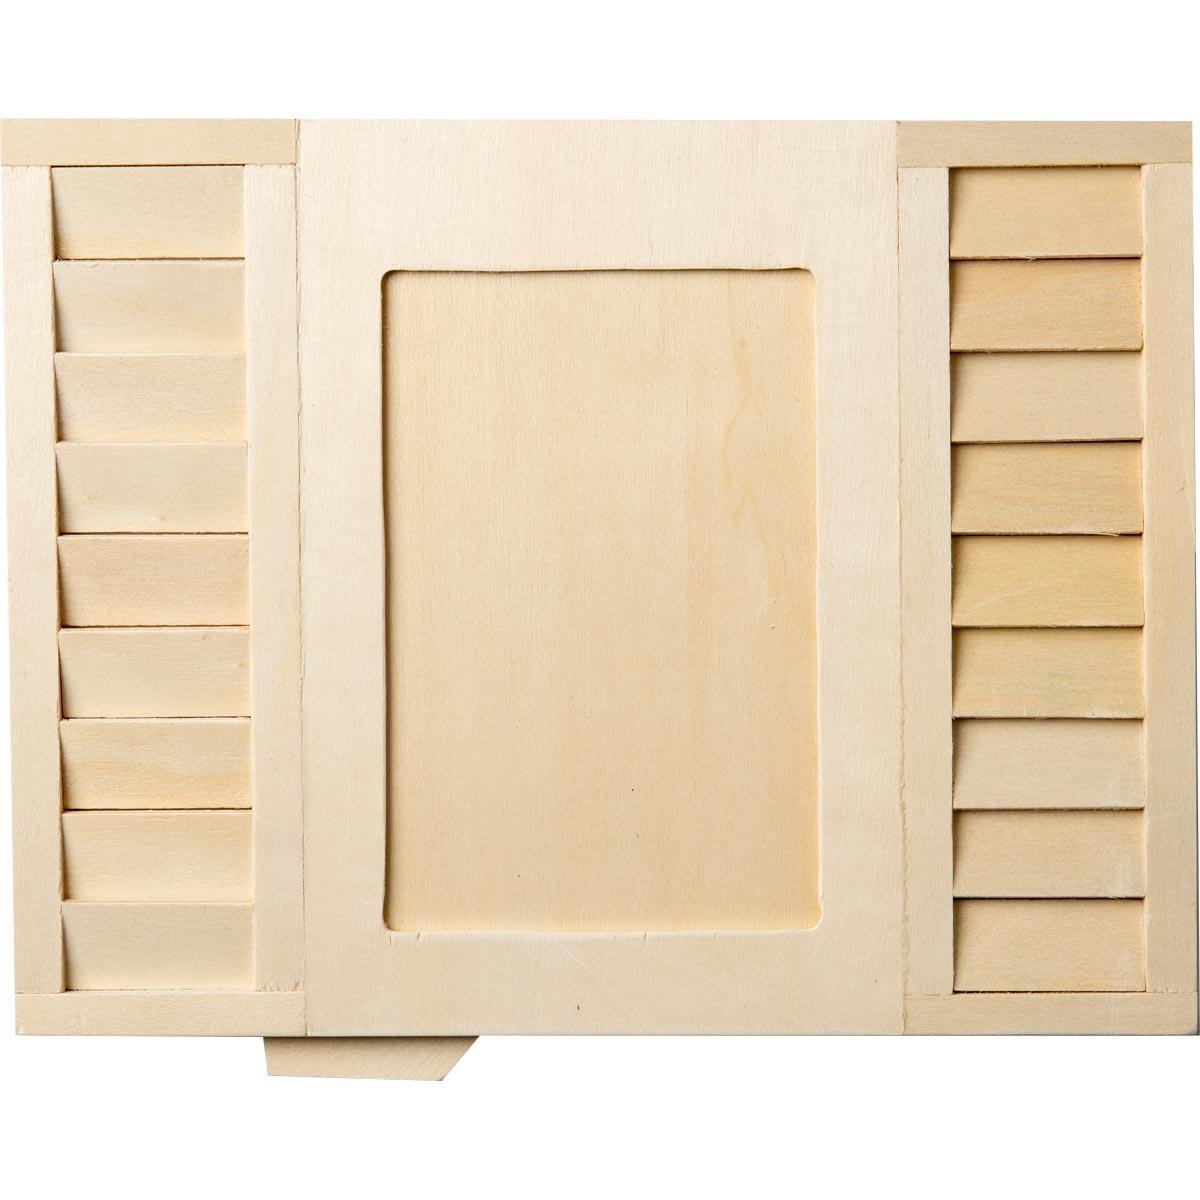 Plaid ® Wood Surfaces - Frames - Shutter, 10